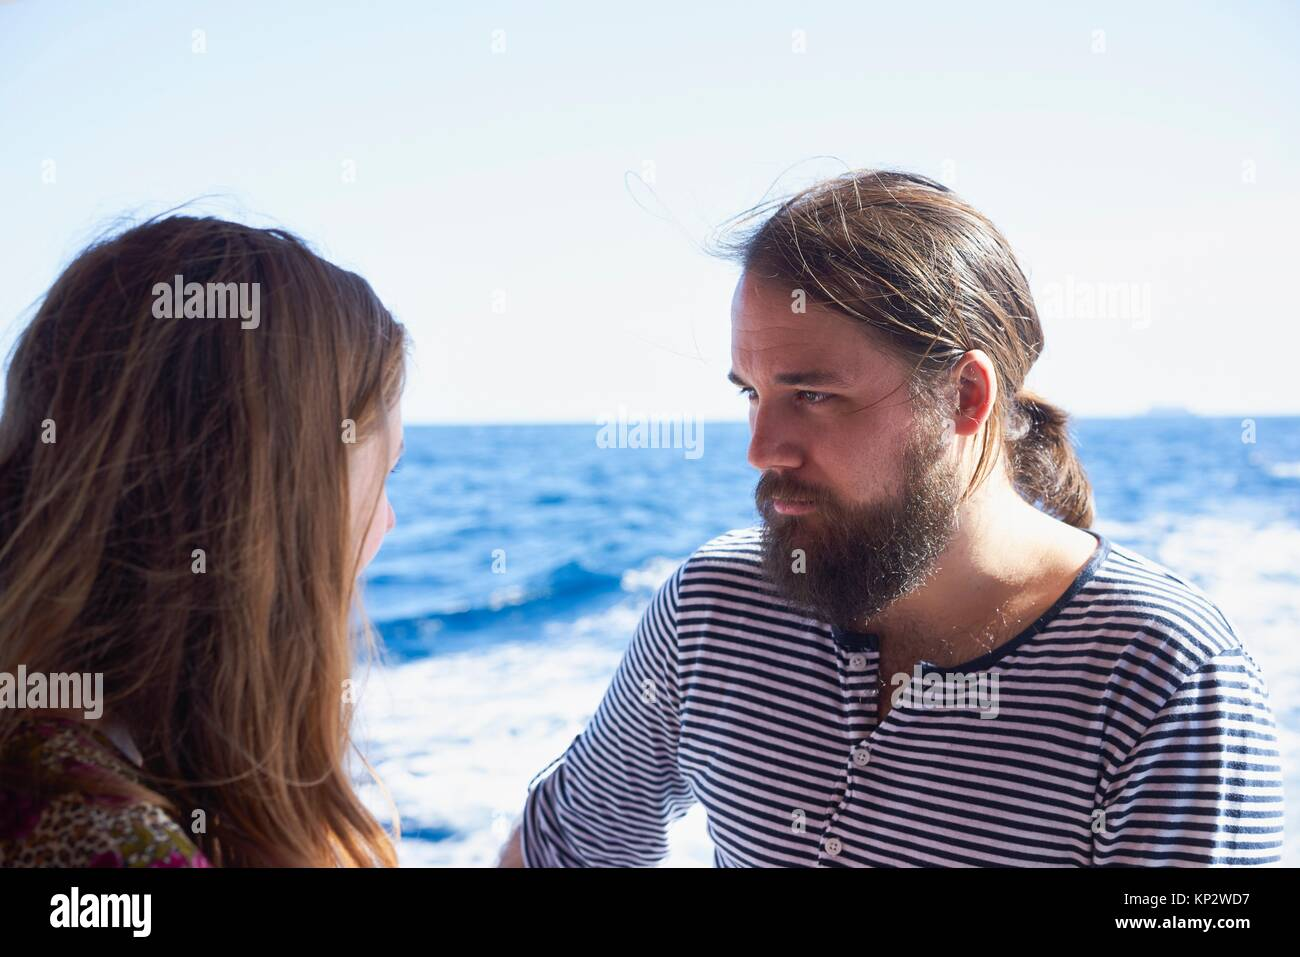 Romantic boyfriend with intense eye contact, next to blue ocean, Gozo, Malta - Stock Image